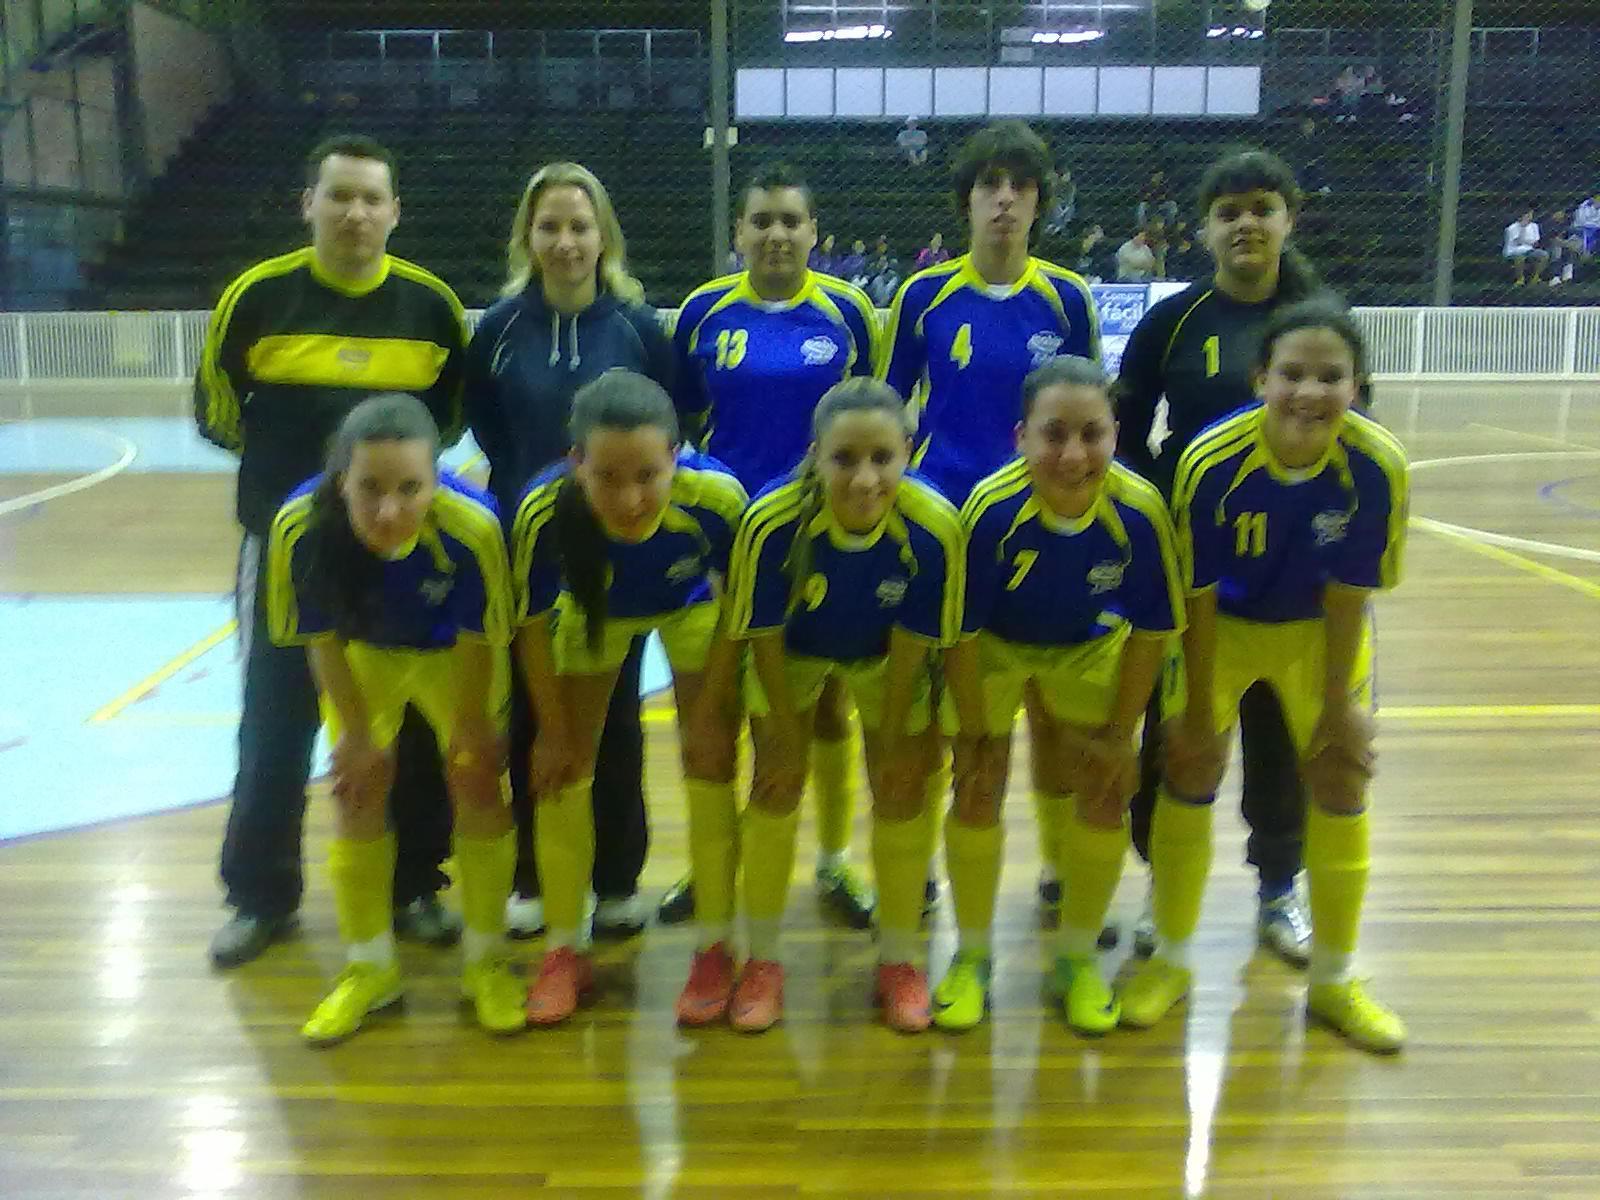 deb2f24369 Setembro 2012 - Esportes na Serra Gaúcha